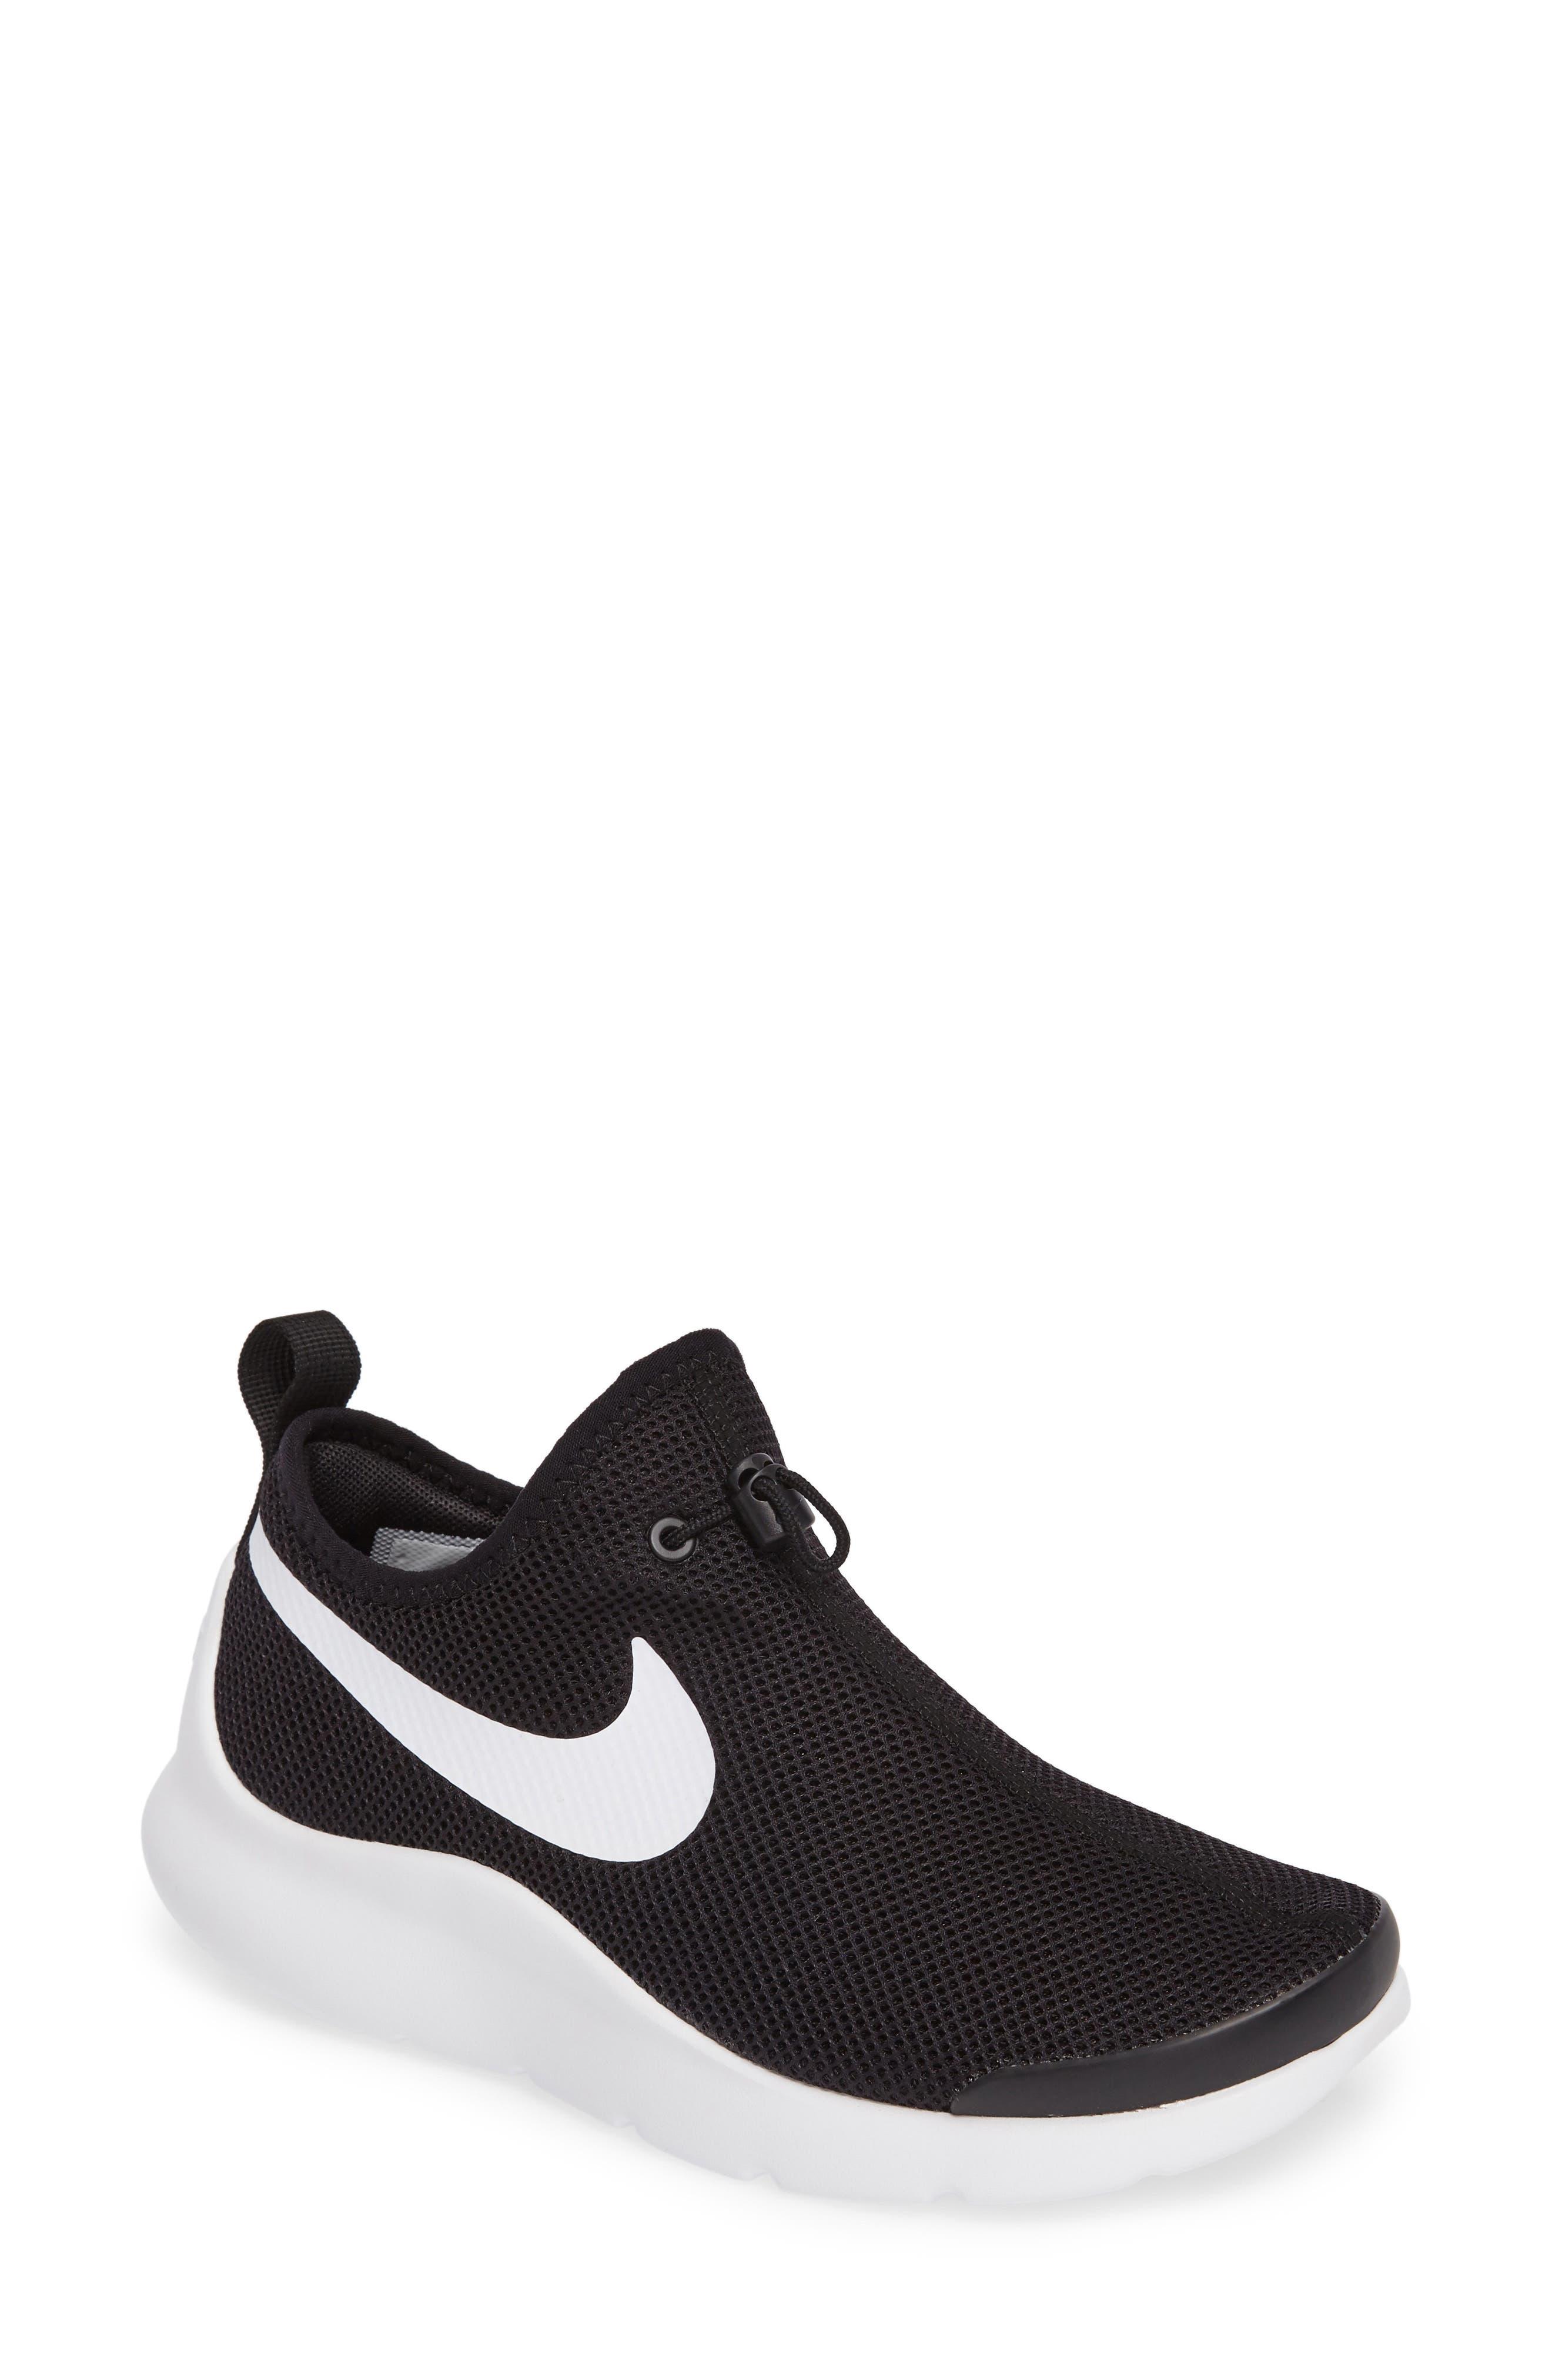 Aptare Slip-On Mesh Sneaker,                         Main,                         color, 002